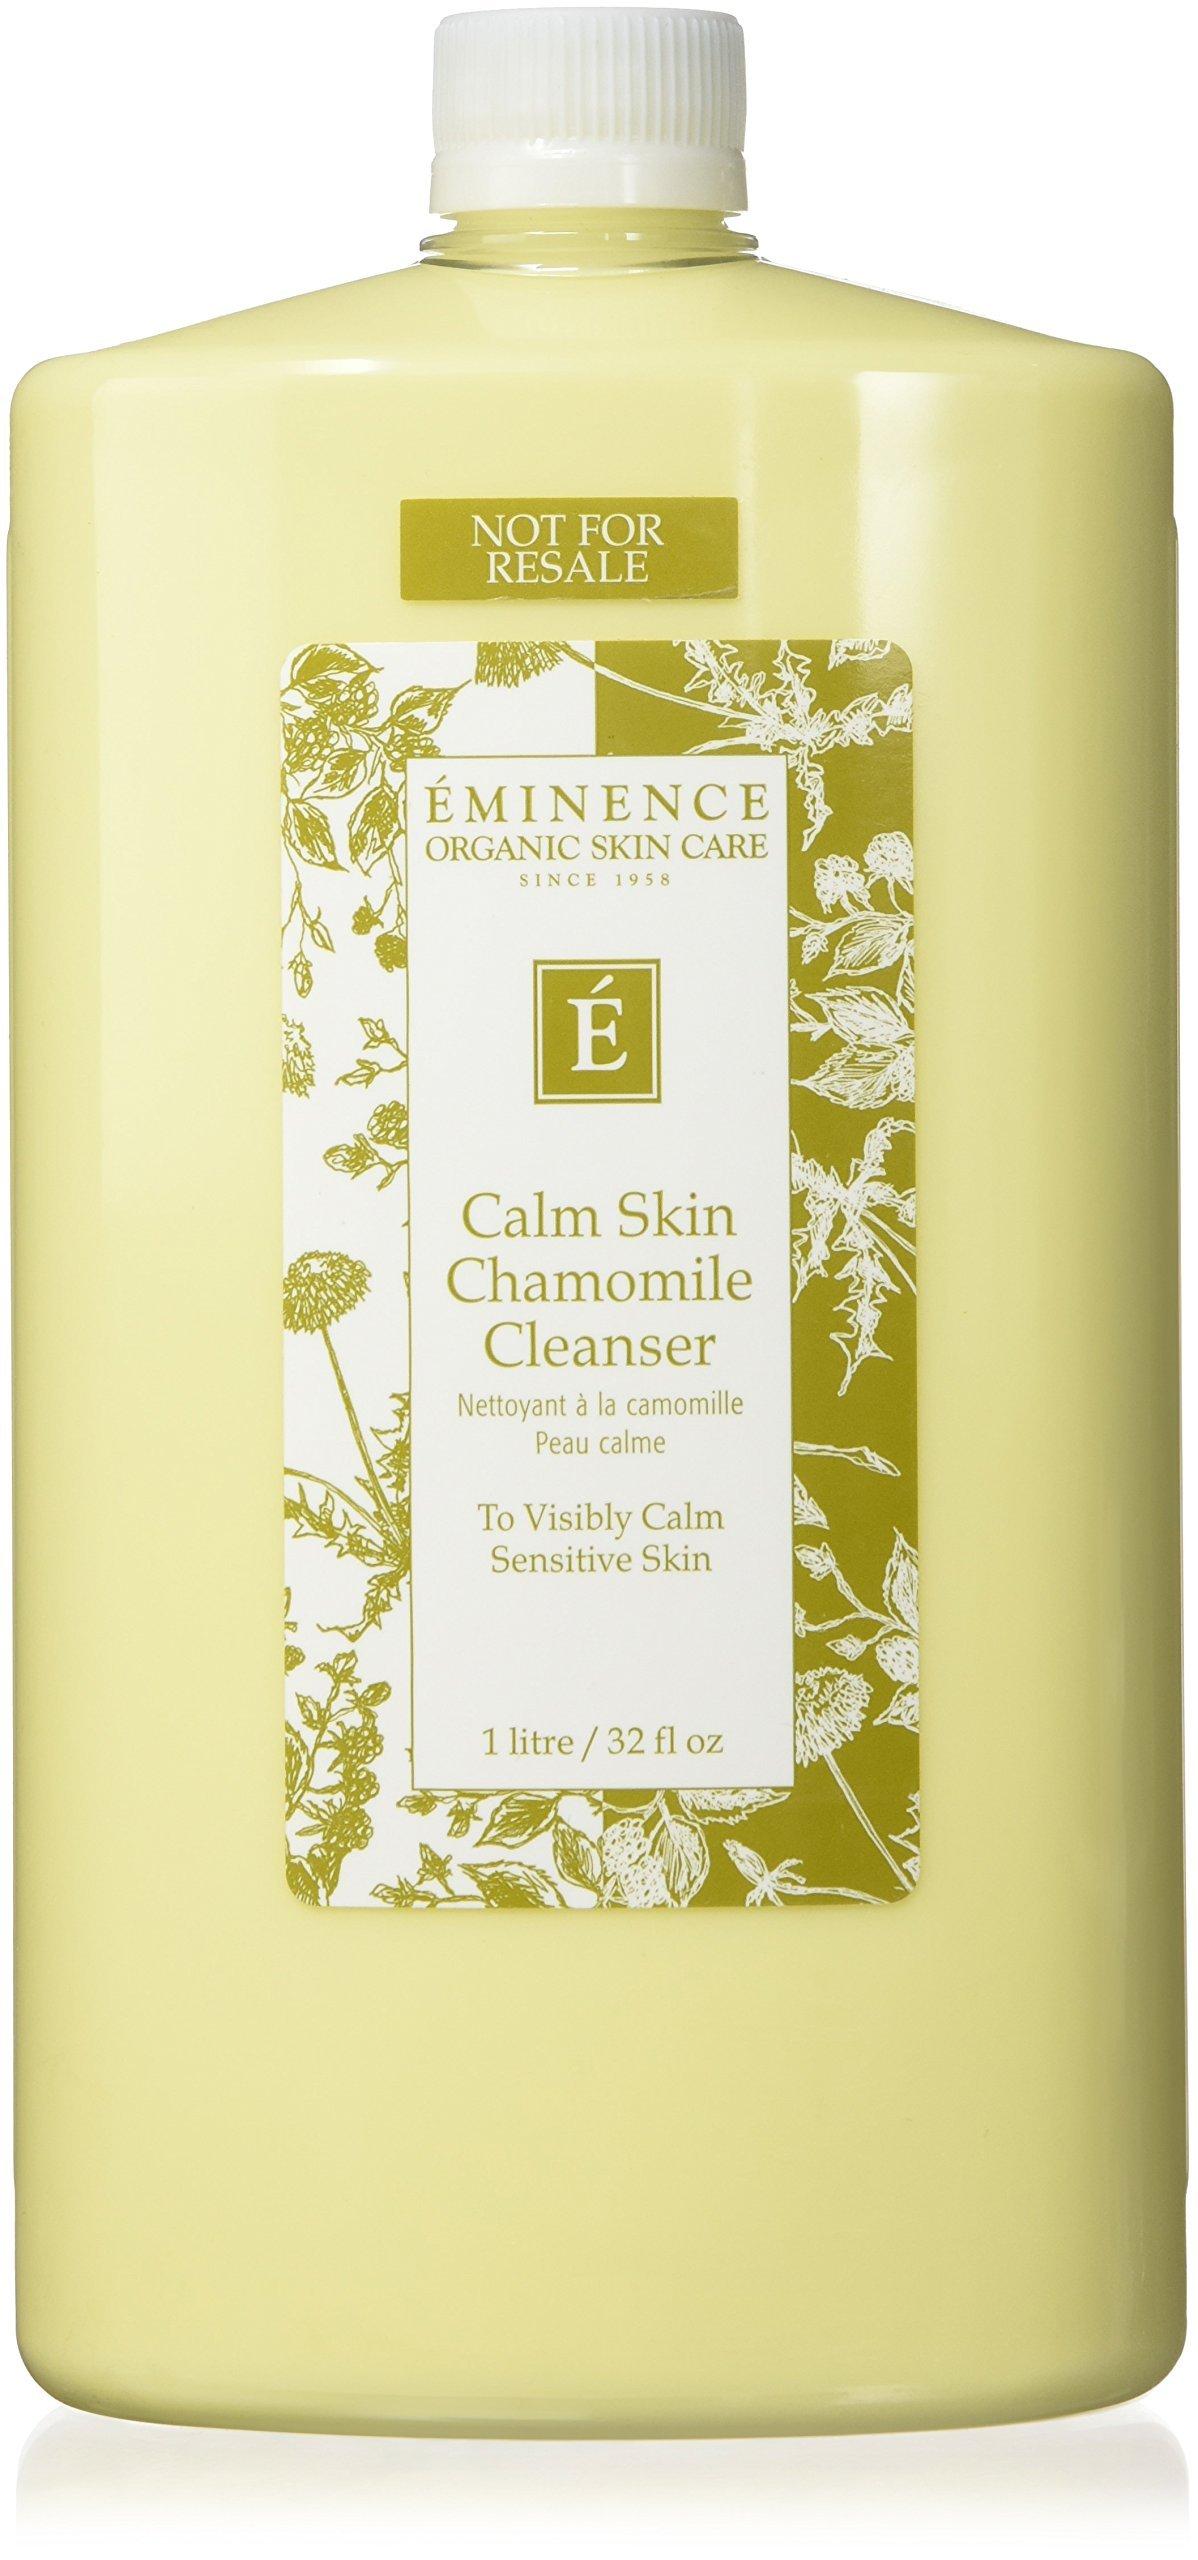 Eminence Organic Skincare Calm Skin Chamomile Cleanser, 32 Fluid Ounce